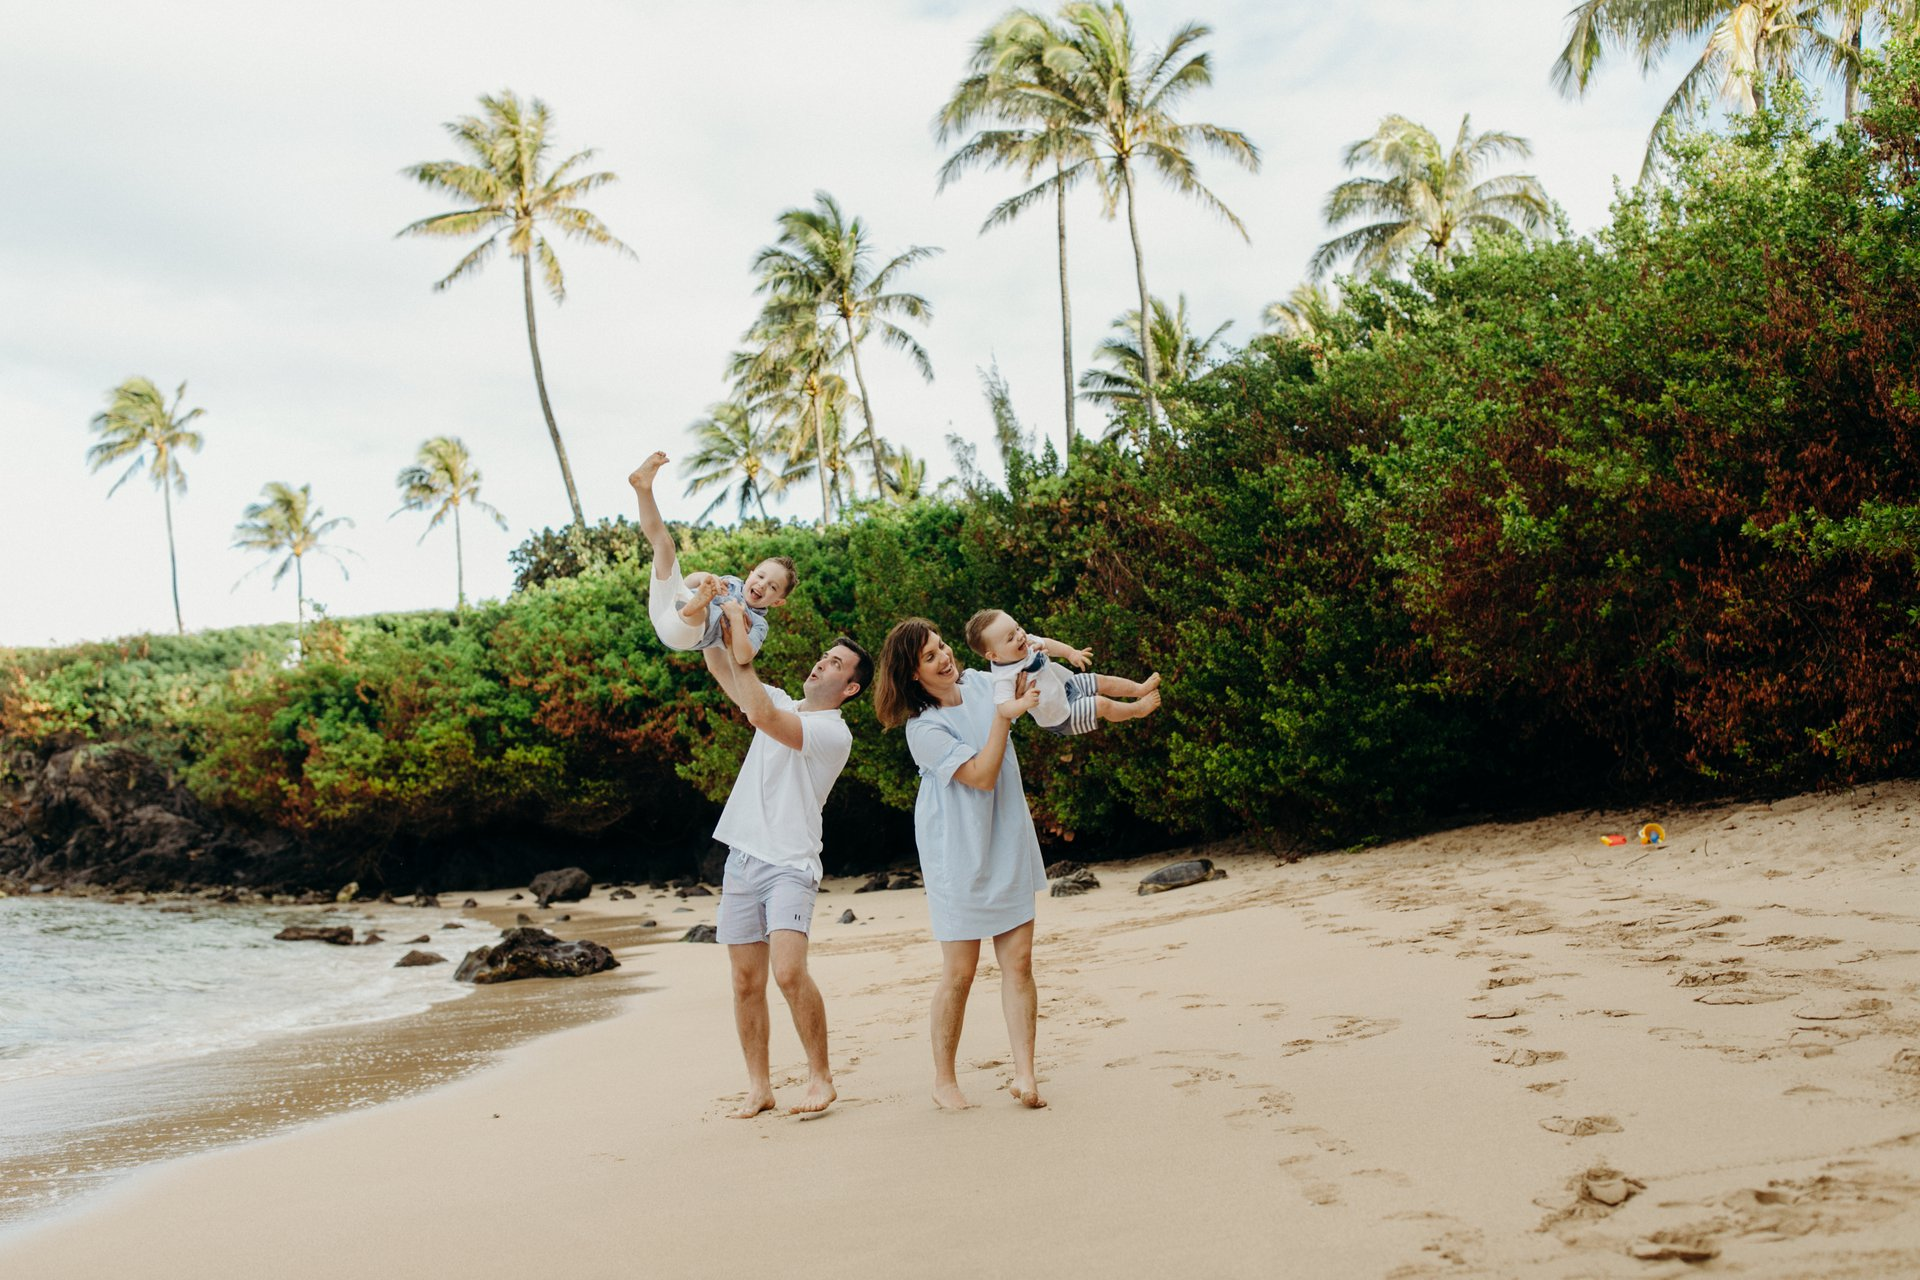 Maui-USA-travel-story-Flytographer-9